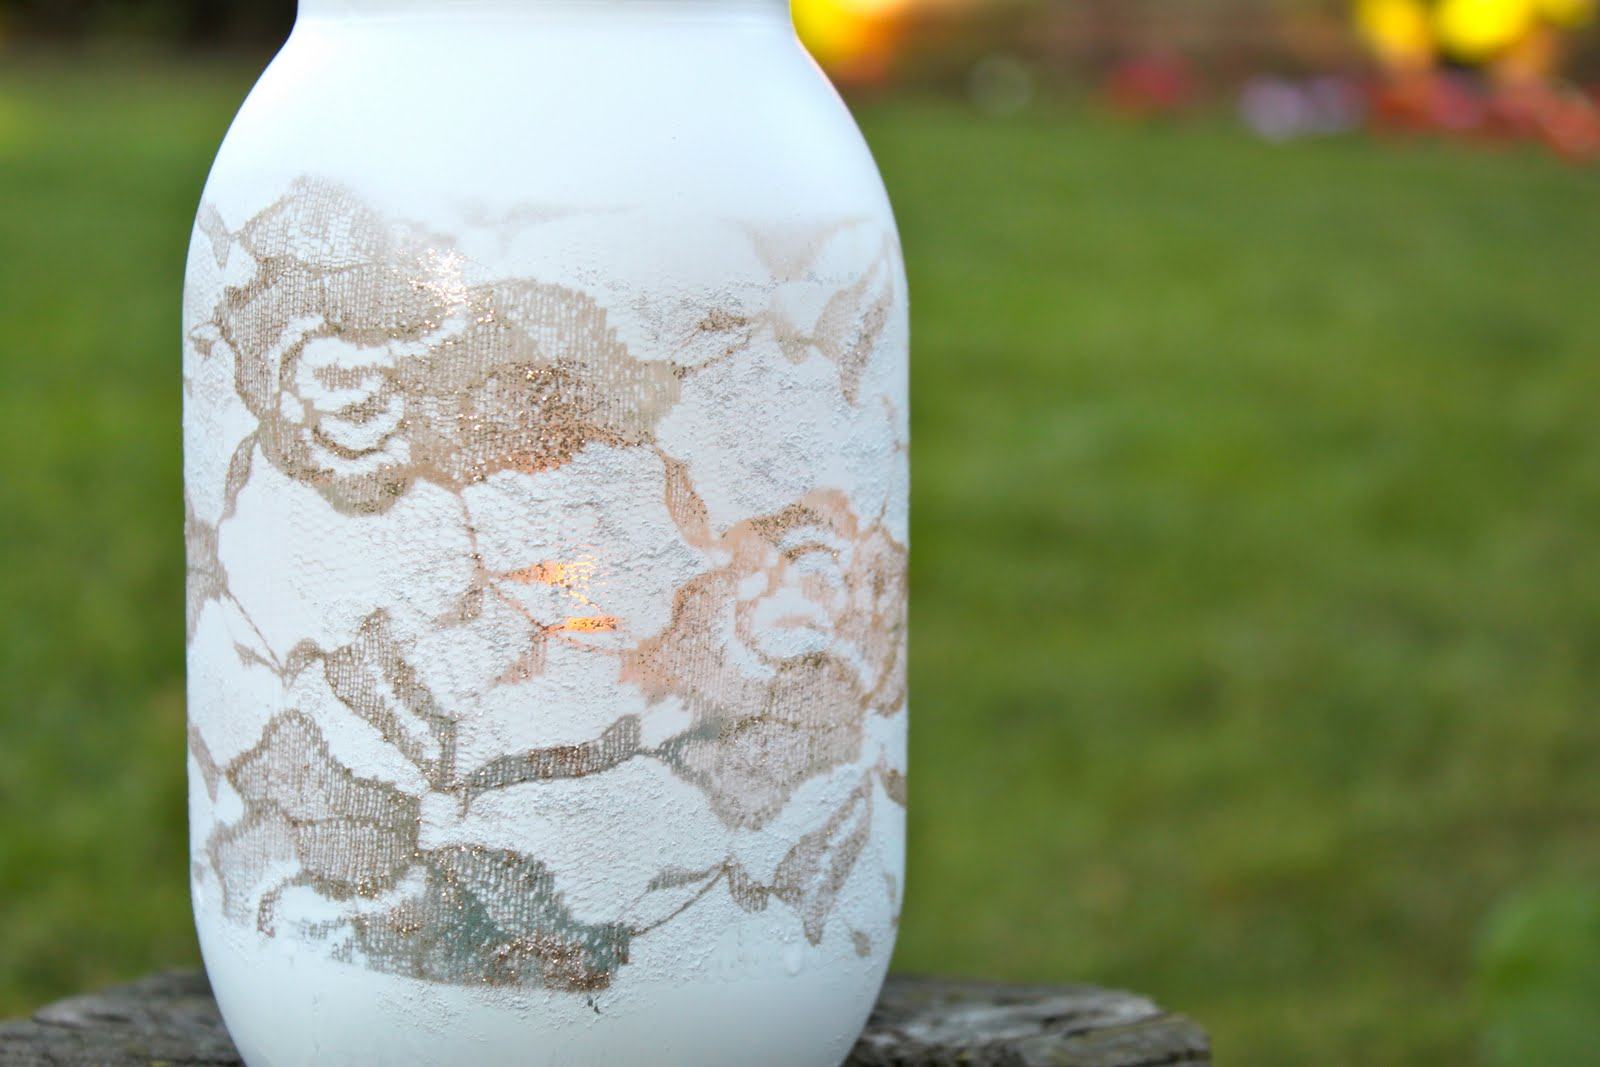 Diy lace vase michaela noelle designs diy lace vase reviewsmspy